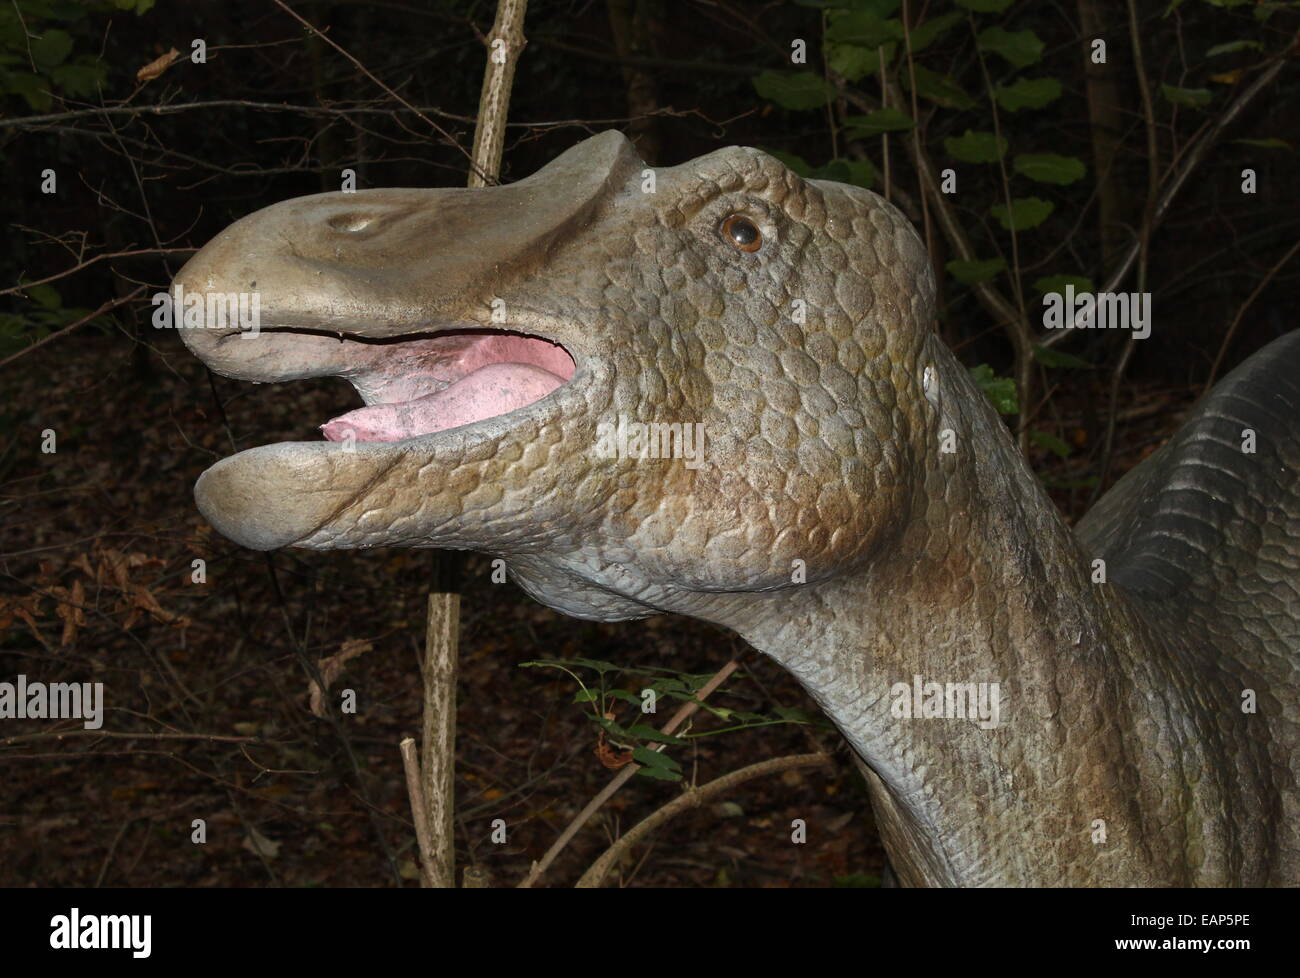 Probactrosaurus, a medium-sized Cretaceous-era herbivorous dinosaur from China, at Dinopark Amersfoort Zoo, Netherlands - Stock Image